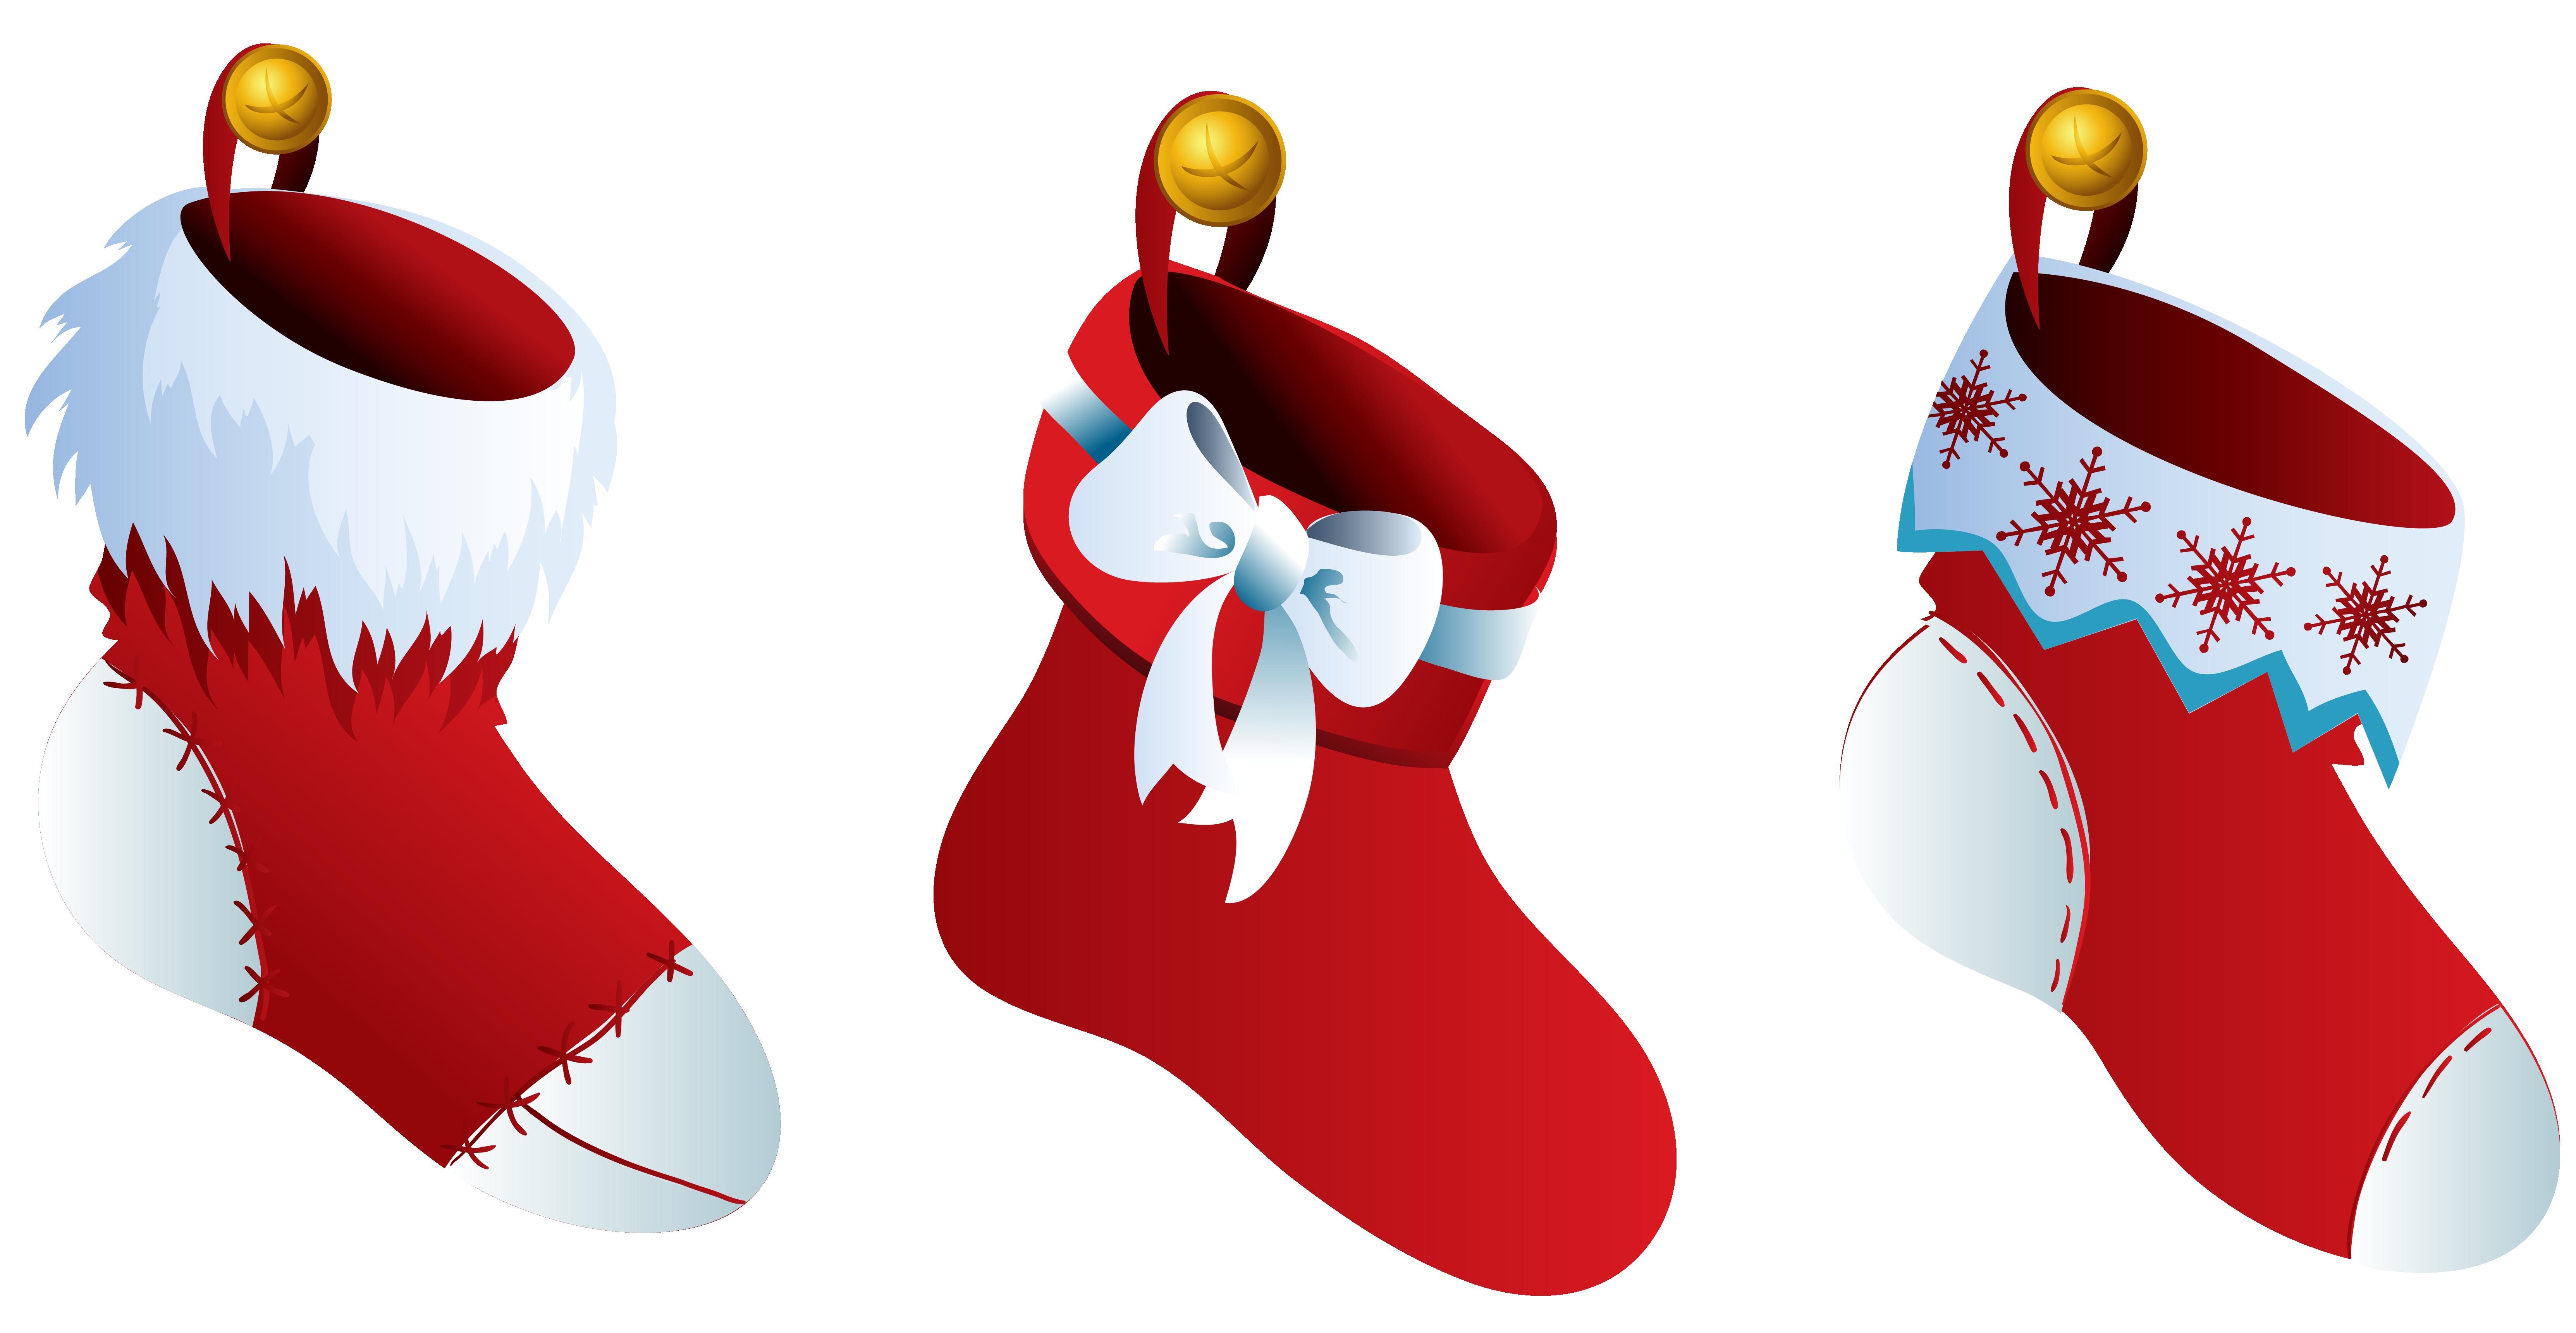 christmas socks clipart at getdrawings com free for personal use rh getdrawings com christmas stockings clipart free christmas stockings clipart black white